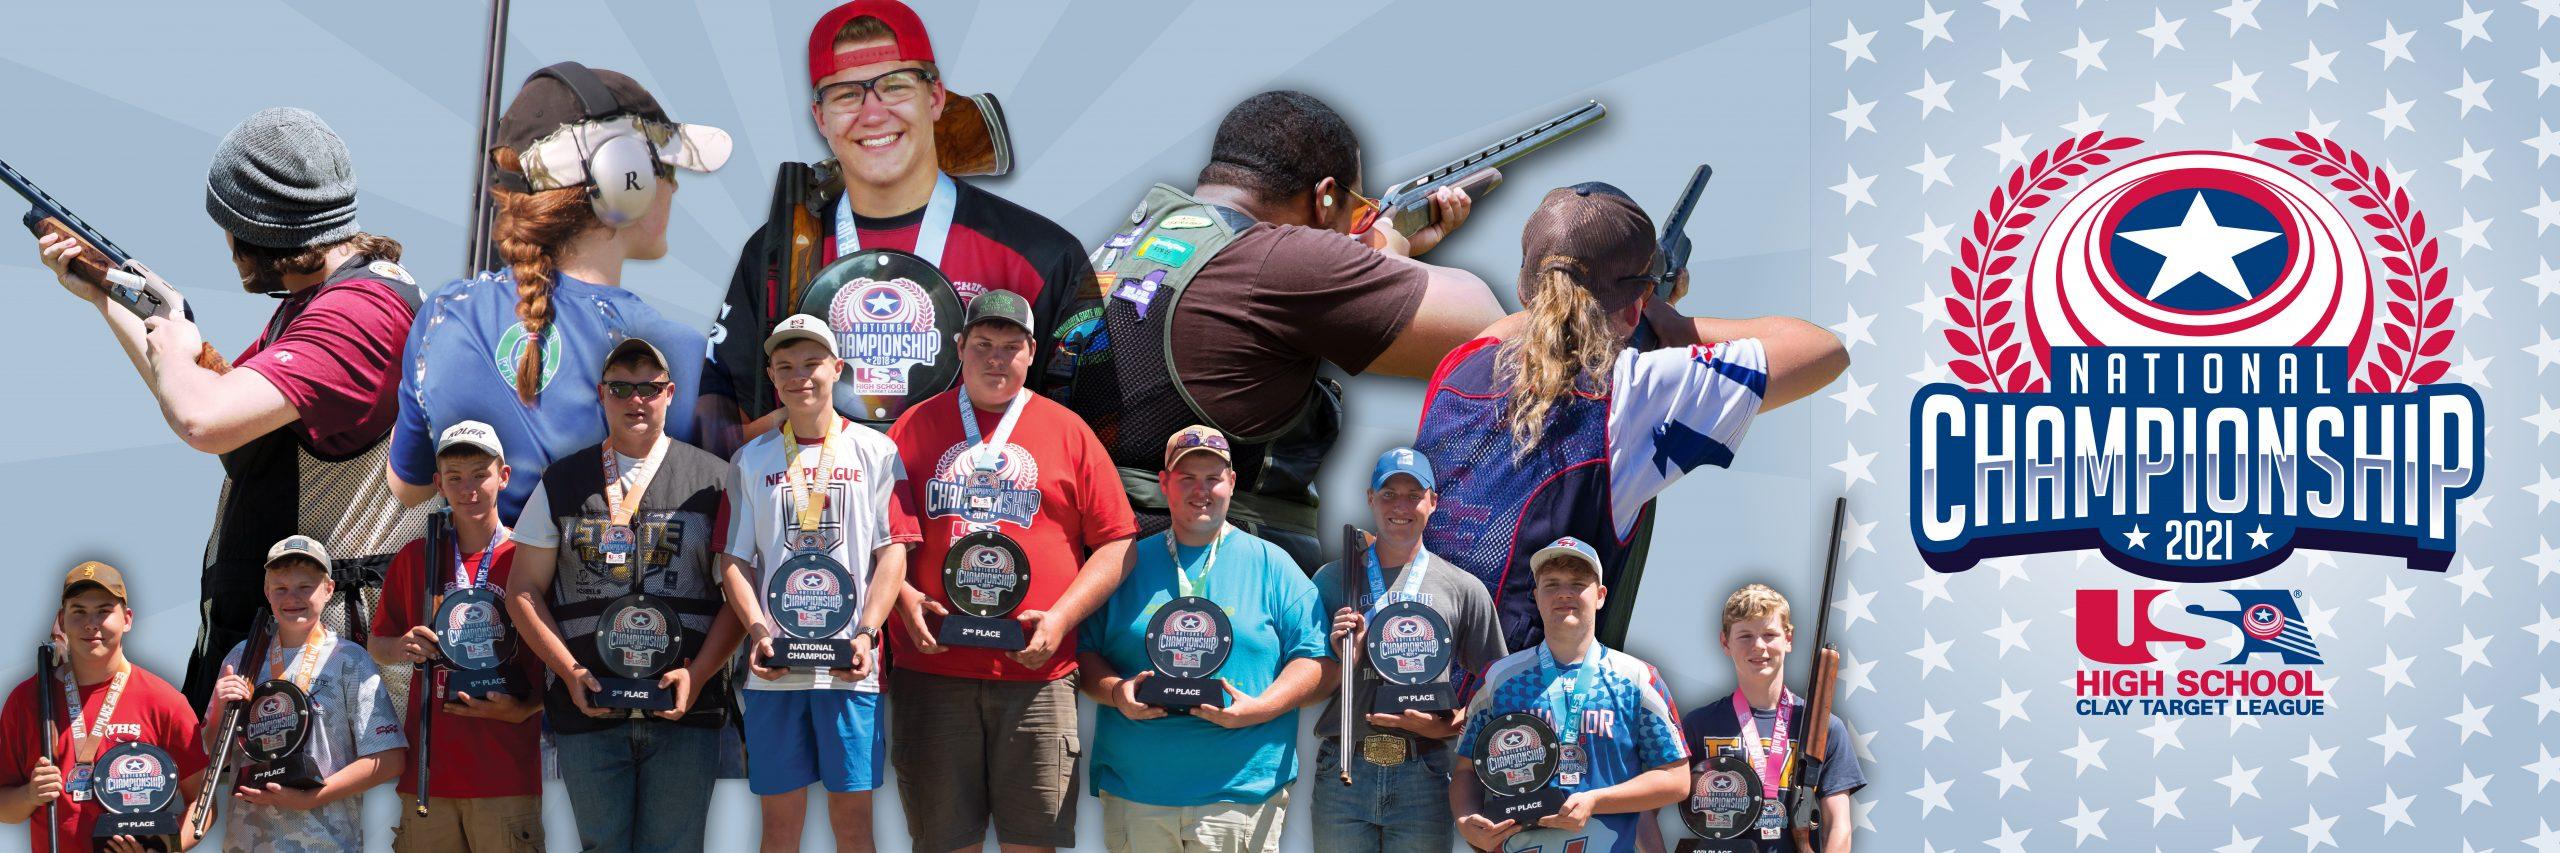 USA High School Clay Target League National Championship